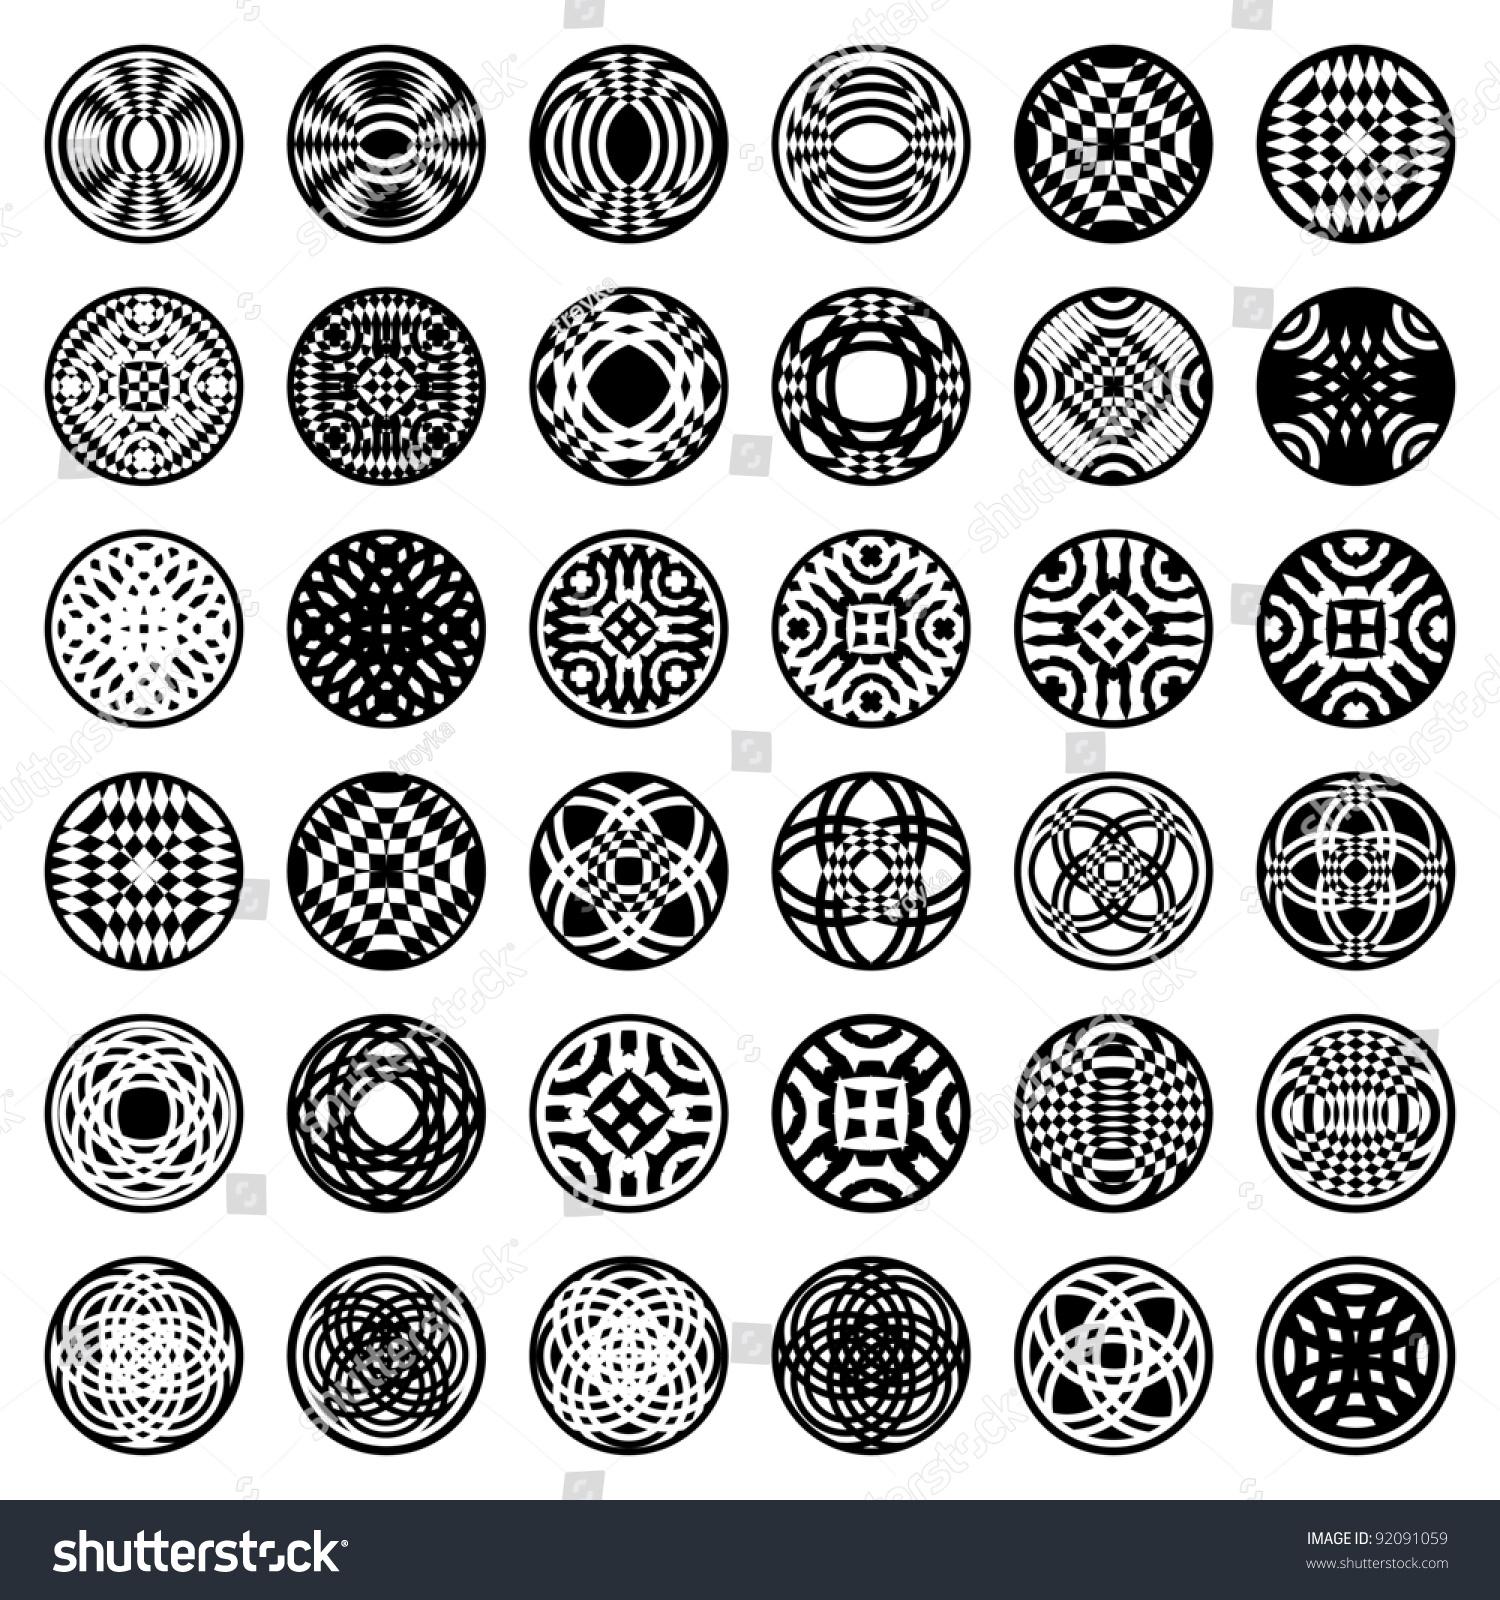 Worksheets Shape Design Patterns patterns in circle shape 36 design elements set 2 vector art save to a lightbox